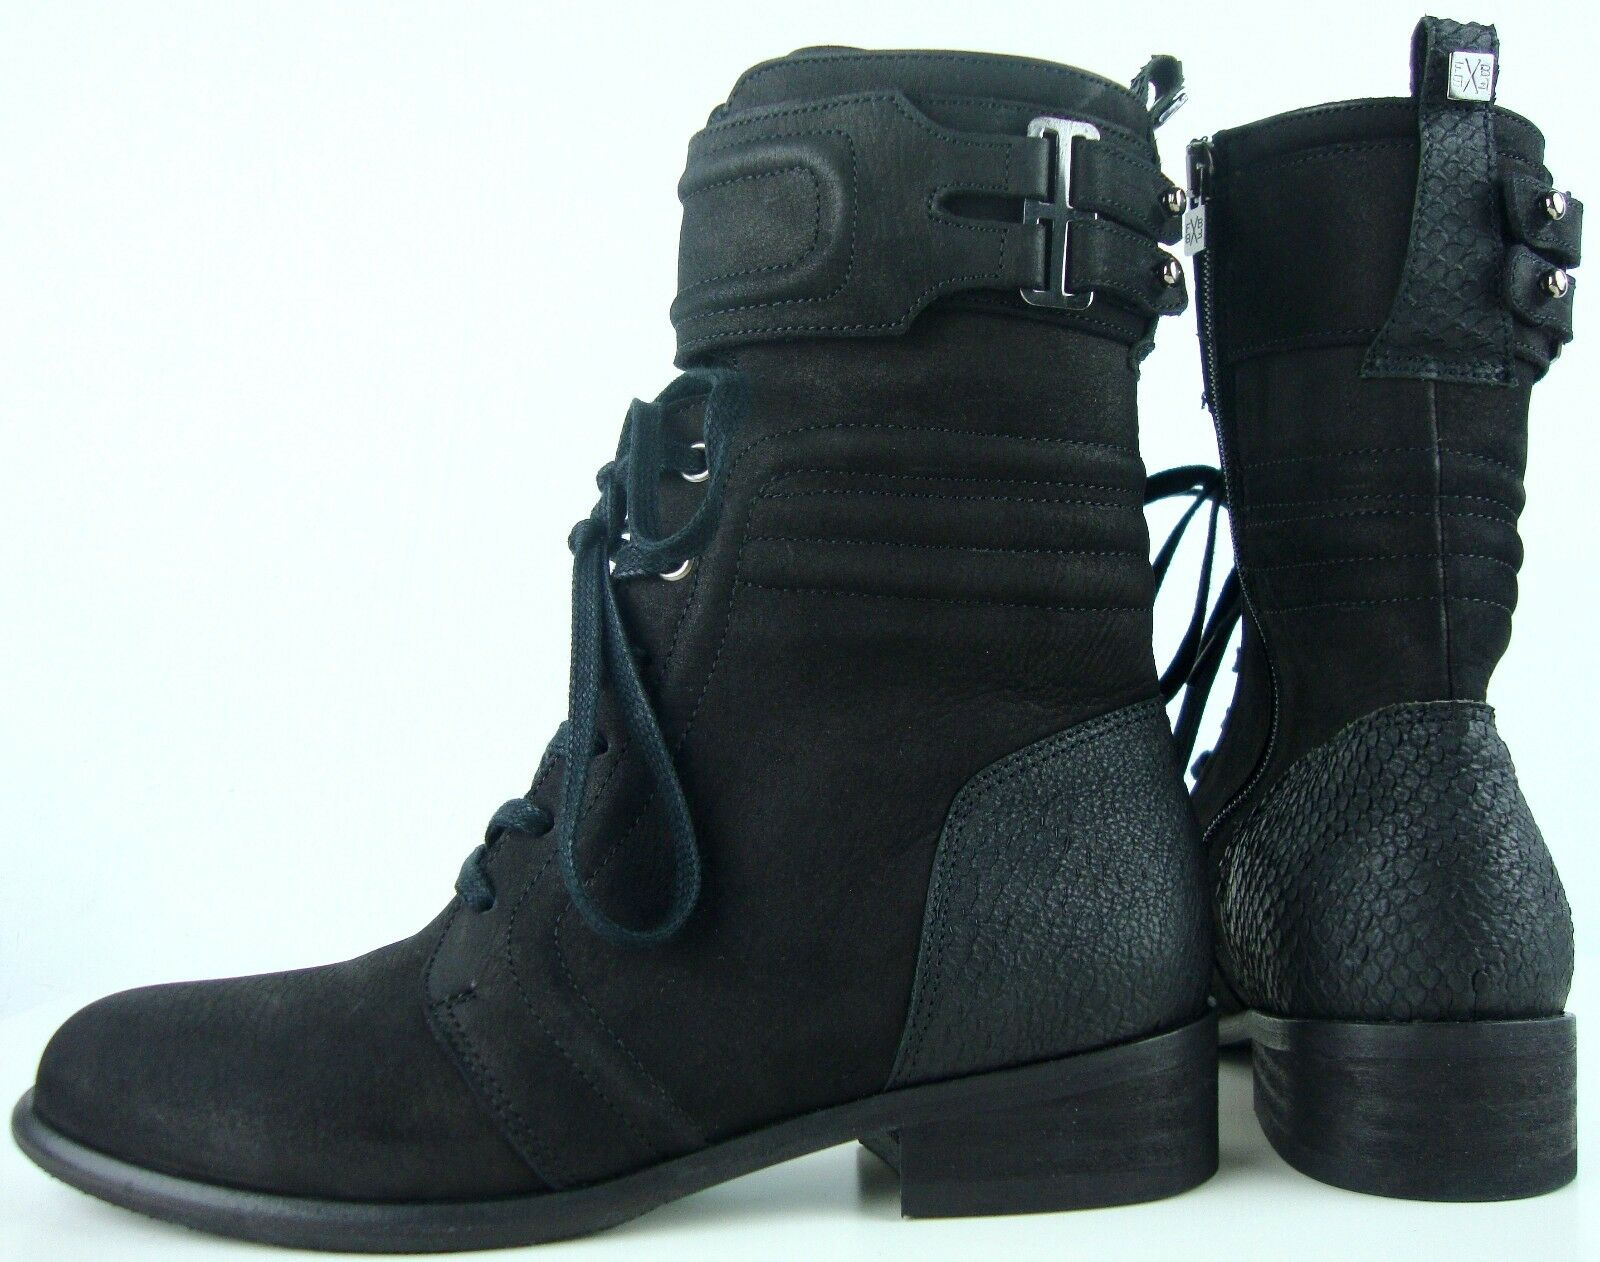 FLORIS VAN BOMMEL Damen Stiefeletten Boots Bootie Leder Schuhe Schwarz Gr.37 NEU